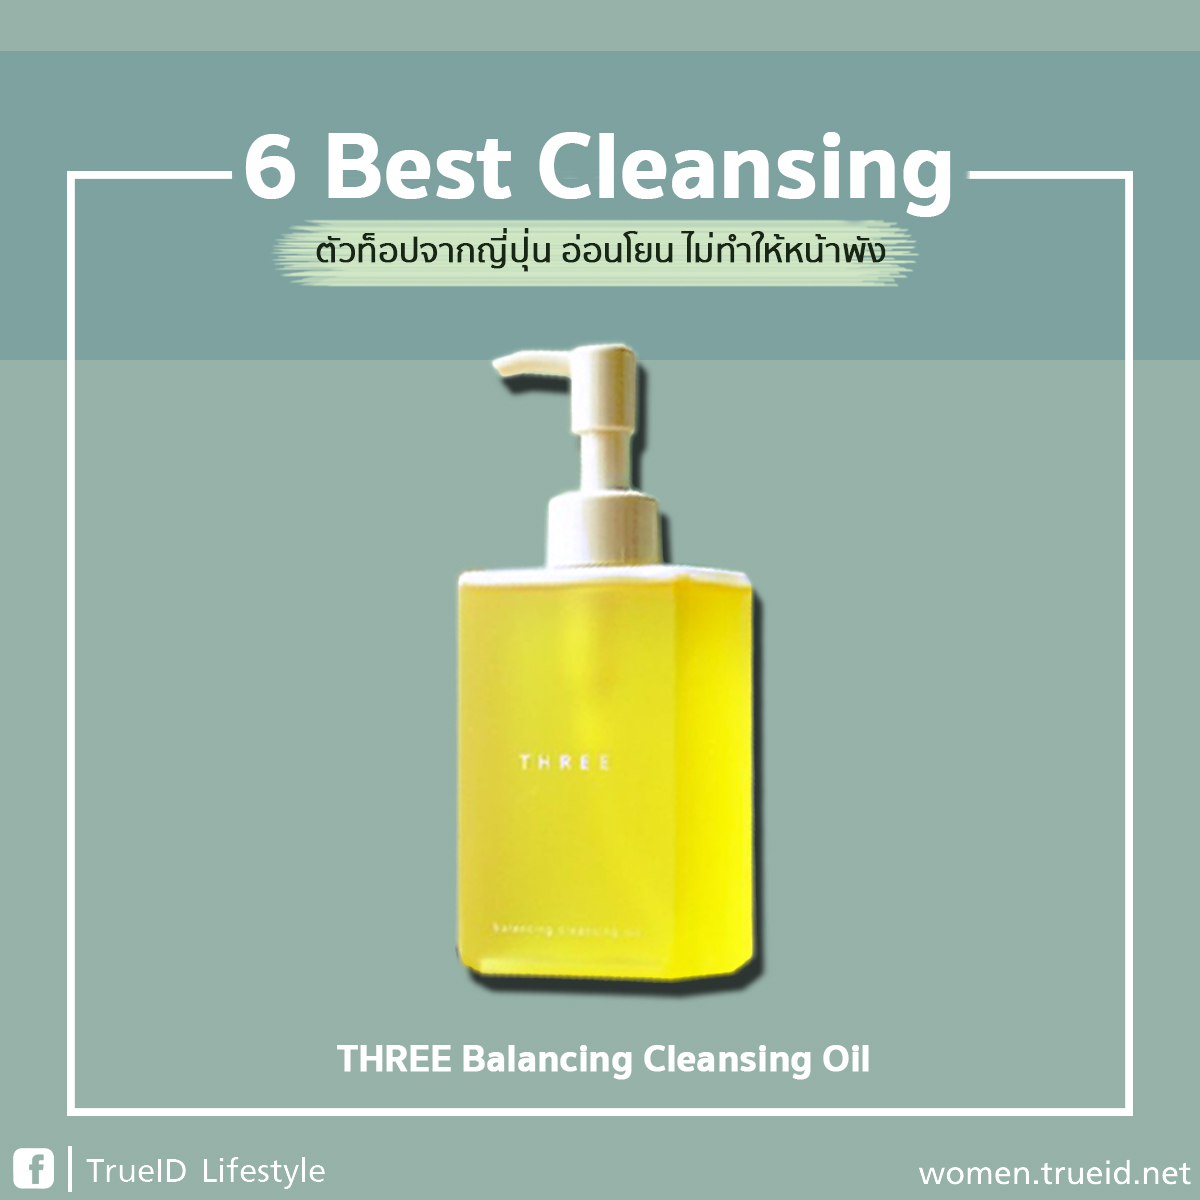 6 Best Cleansing ตัวท็อปจากญี่ปุ่น อ่อนโยน ไม่ทำให้หน้าพัง ผิวแพ้ง่ายห้ามพลาด!